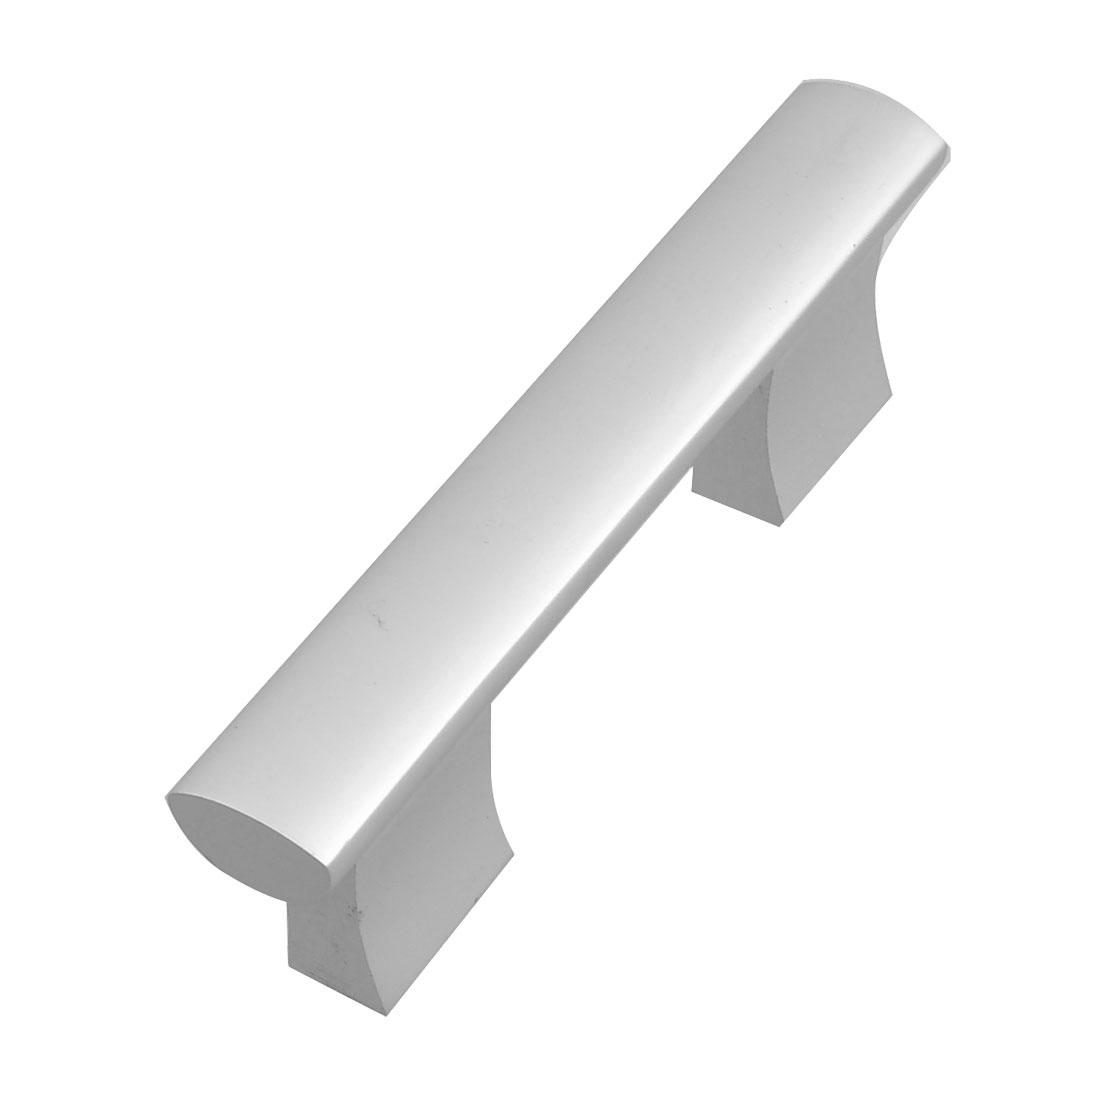 "Cupboard Screw Fix Silver Tone Aluminum 3.9"" Length Bar Pull Handle"